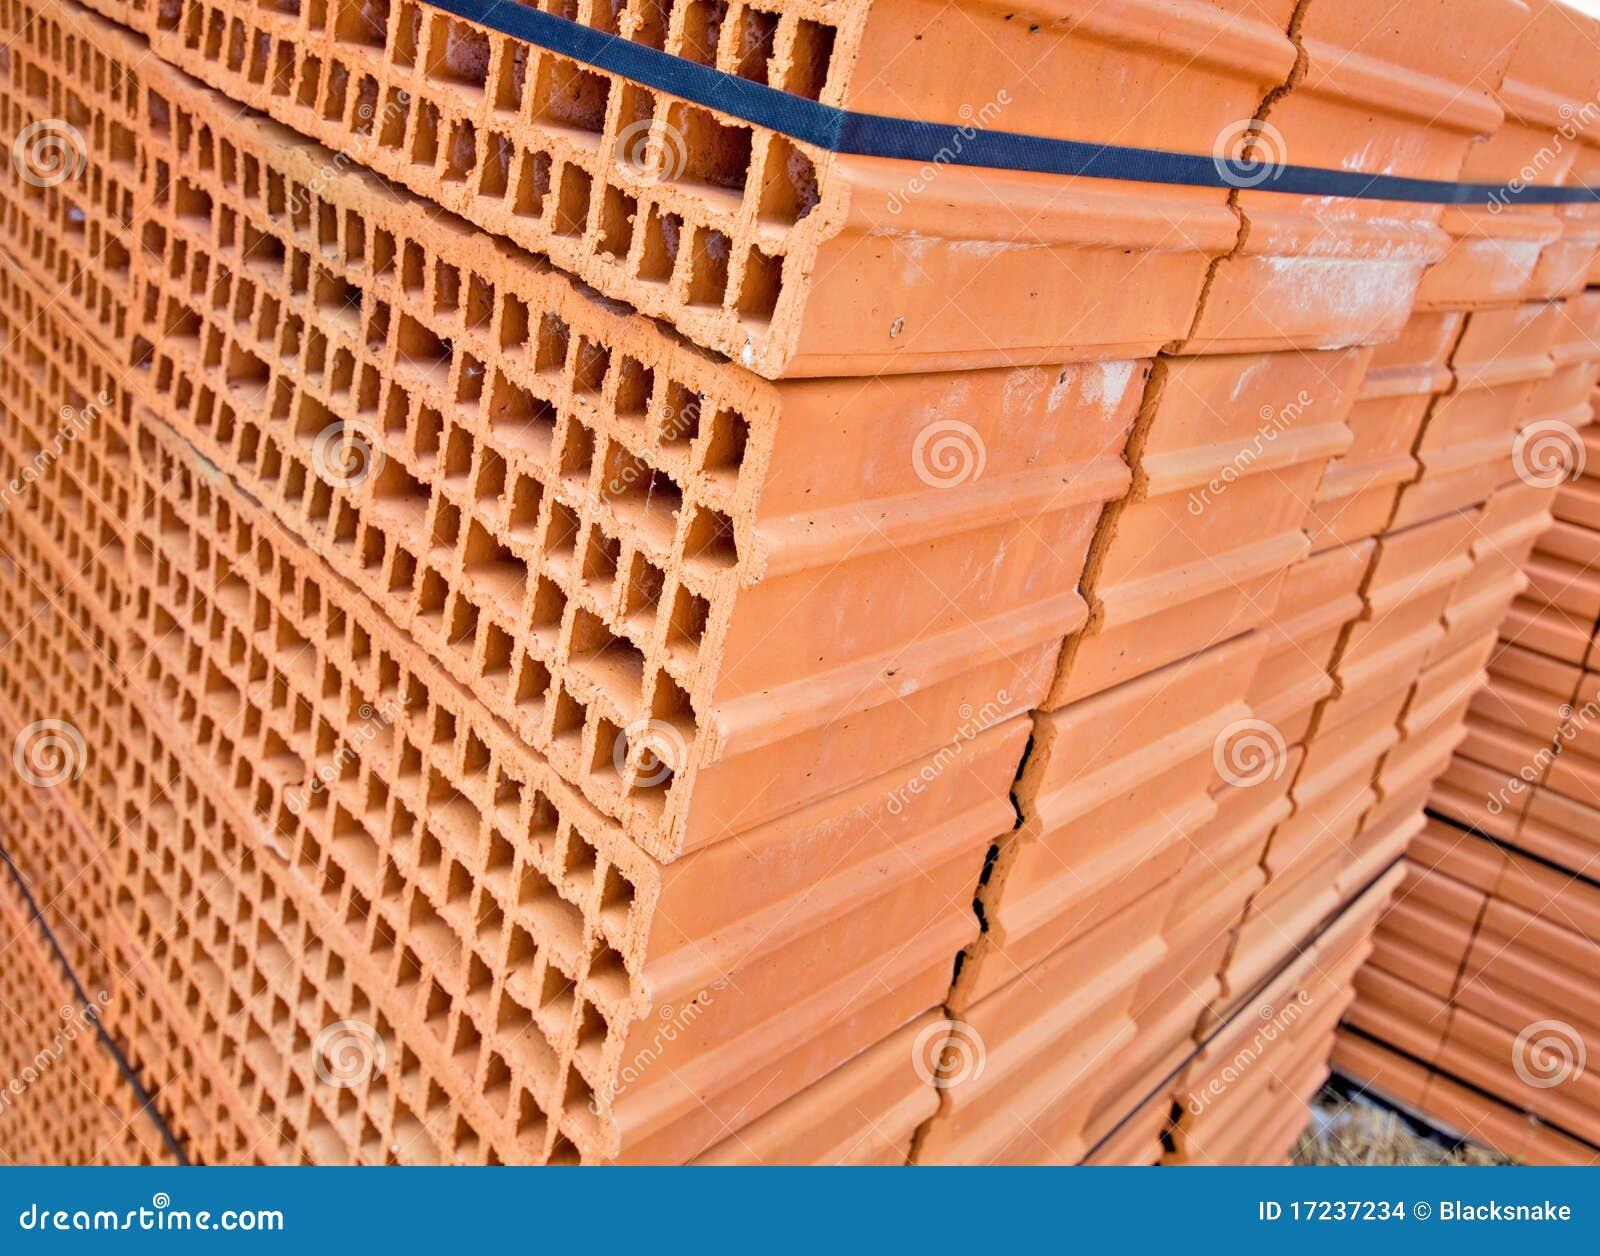 Wall Construction Materials : Orange brick building wall material stock photo image